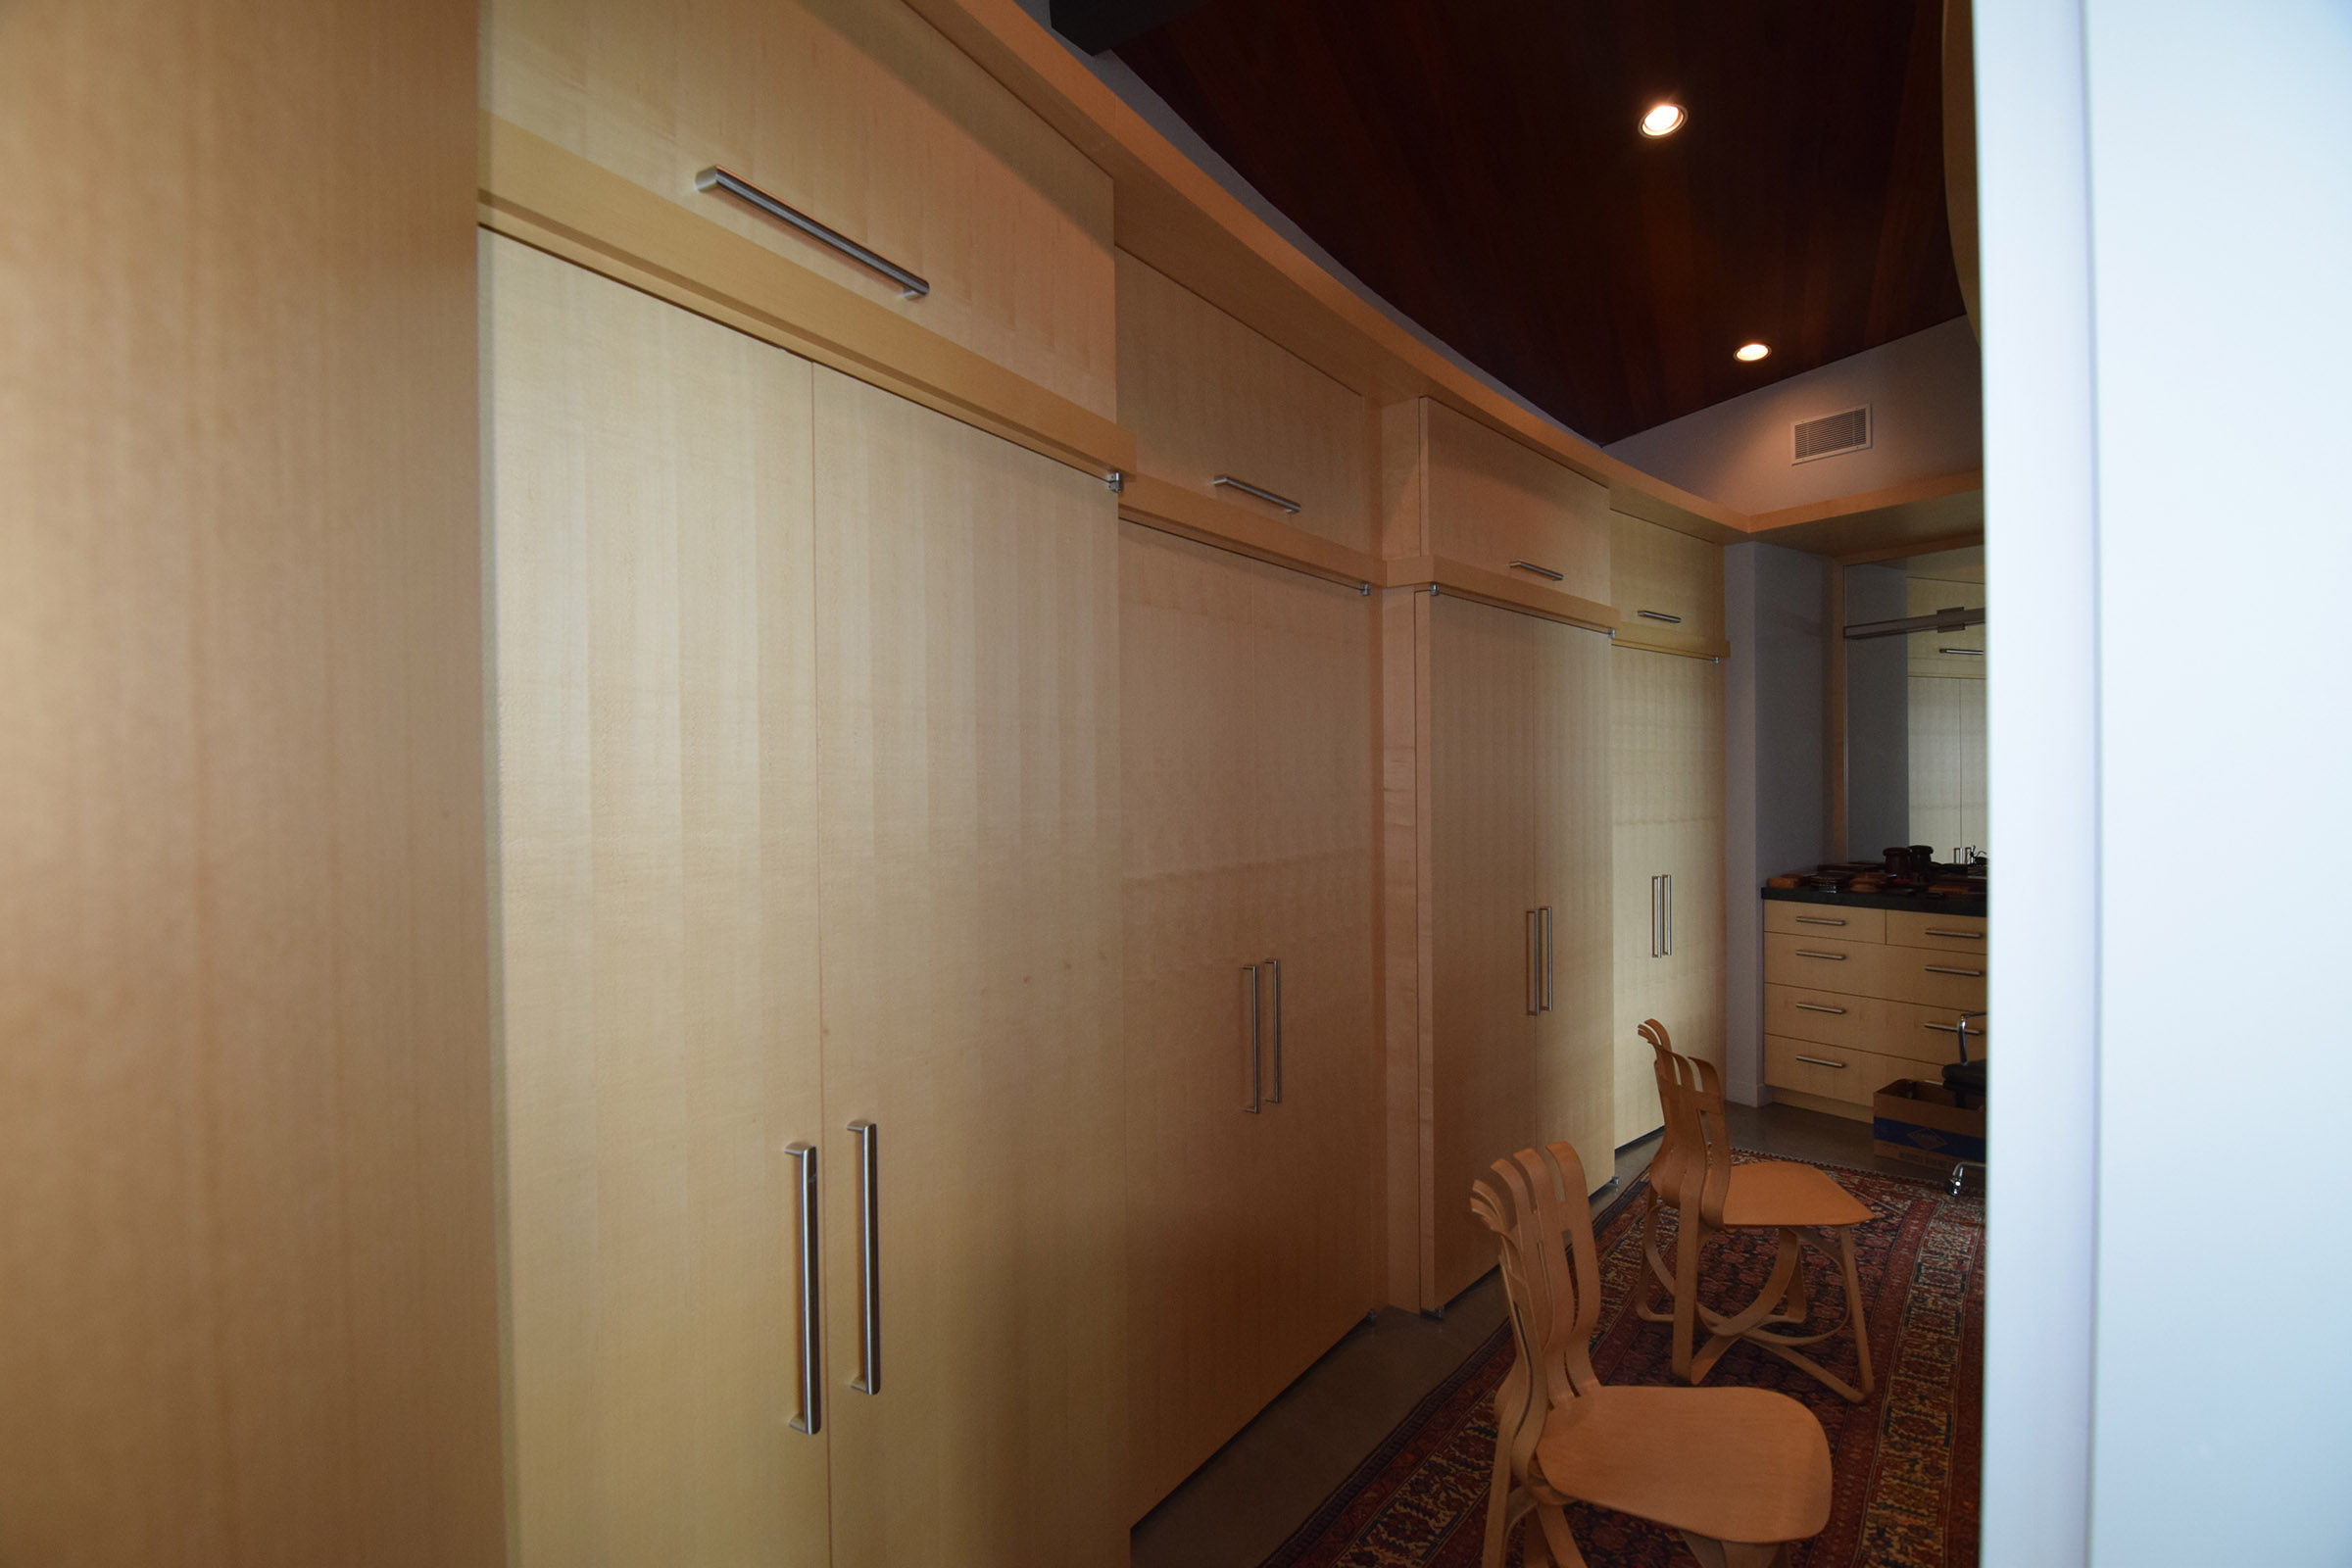 Rift Anigre Custom Closets on a curve with Matching Dresser & Mirror